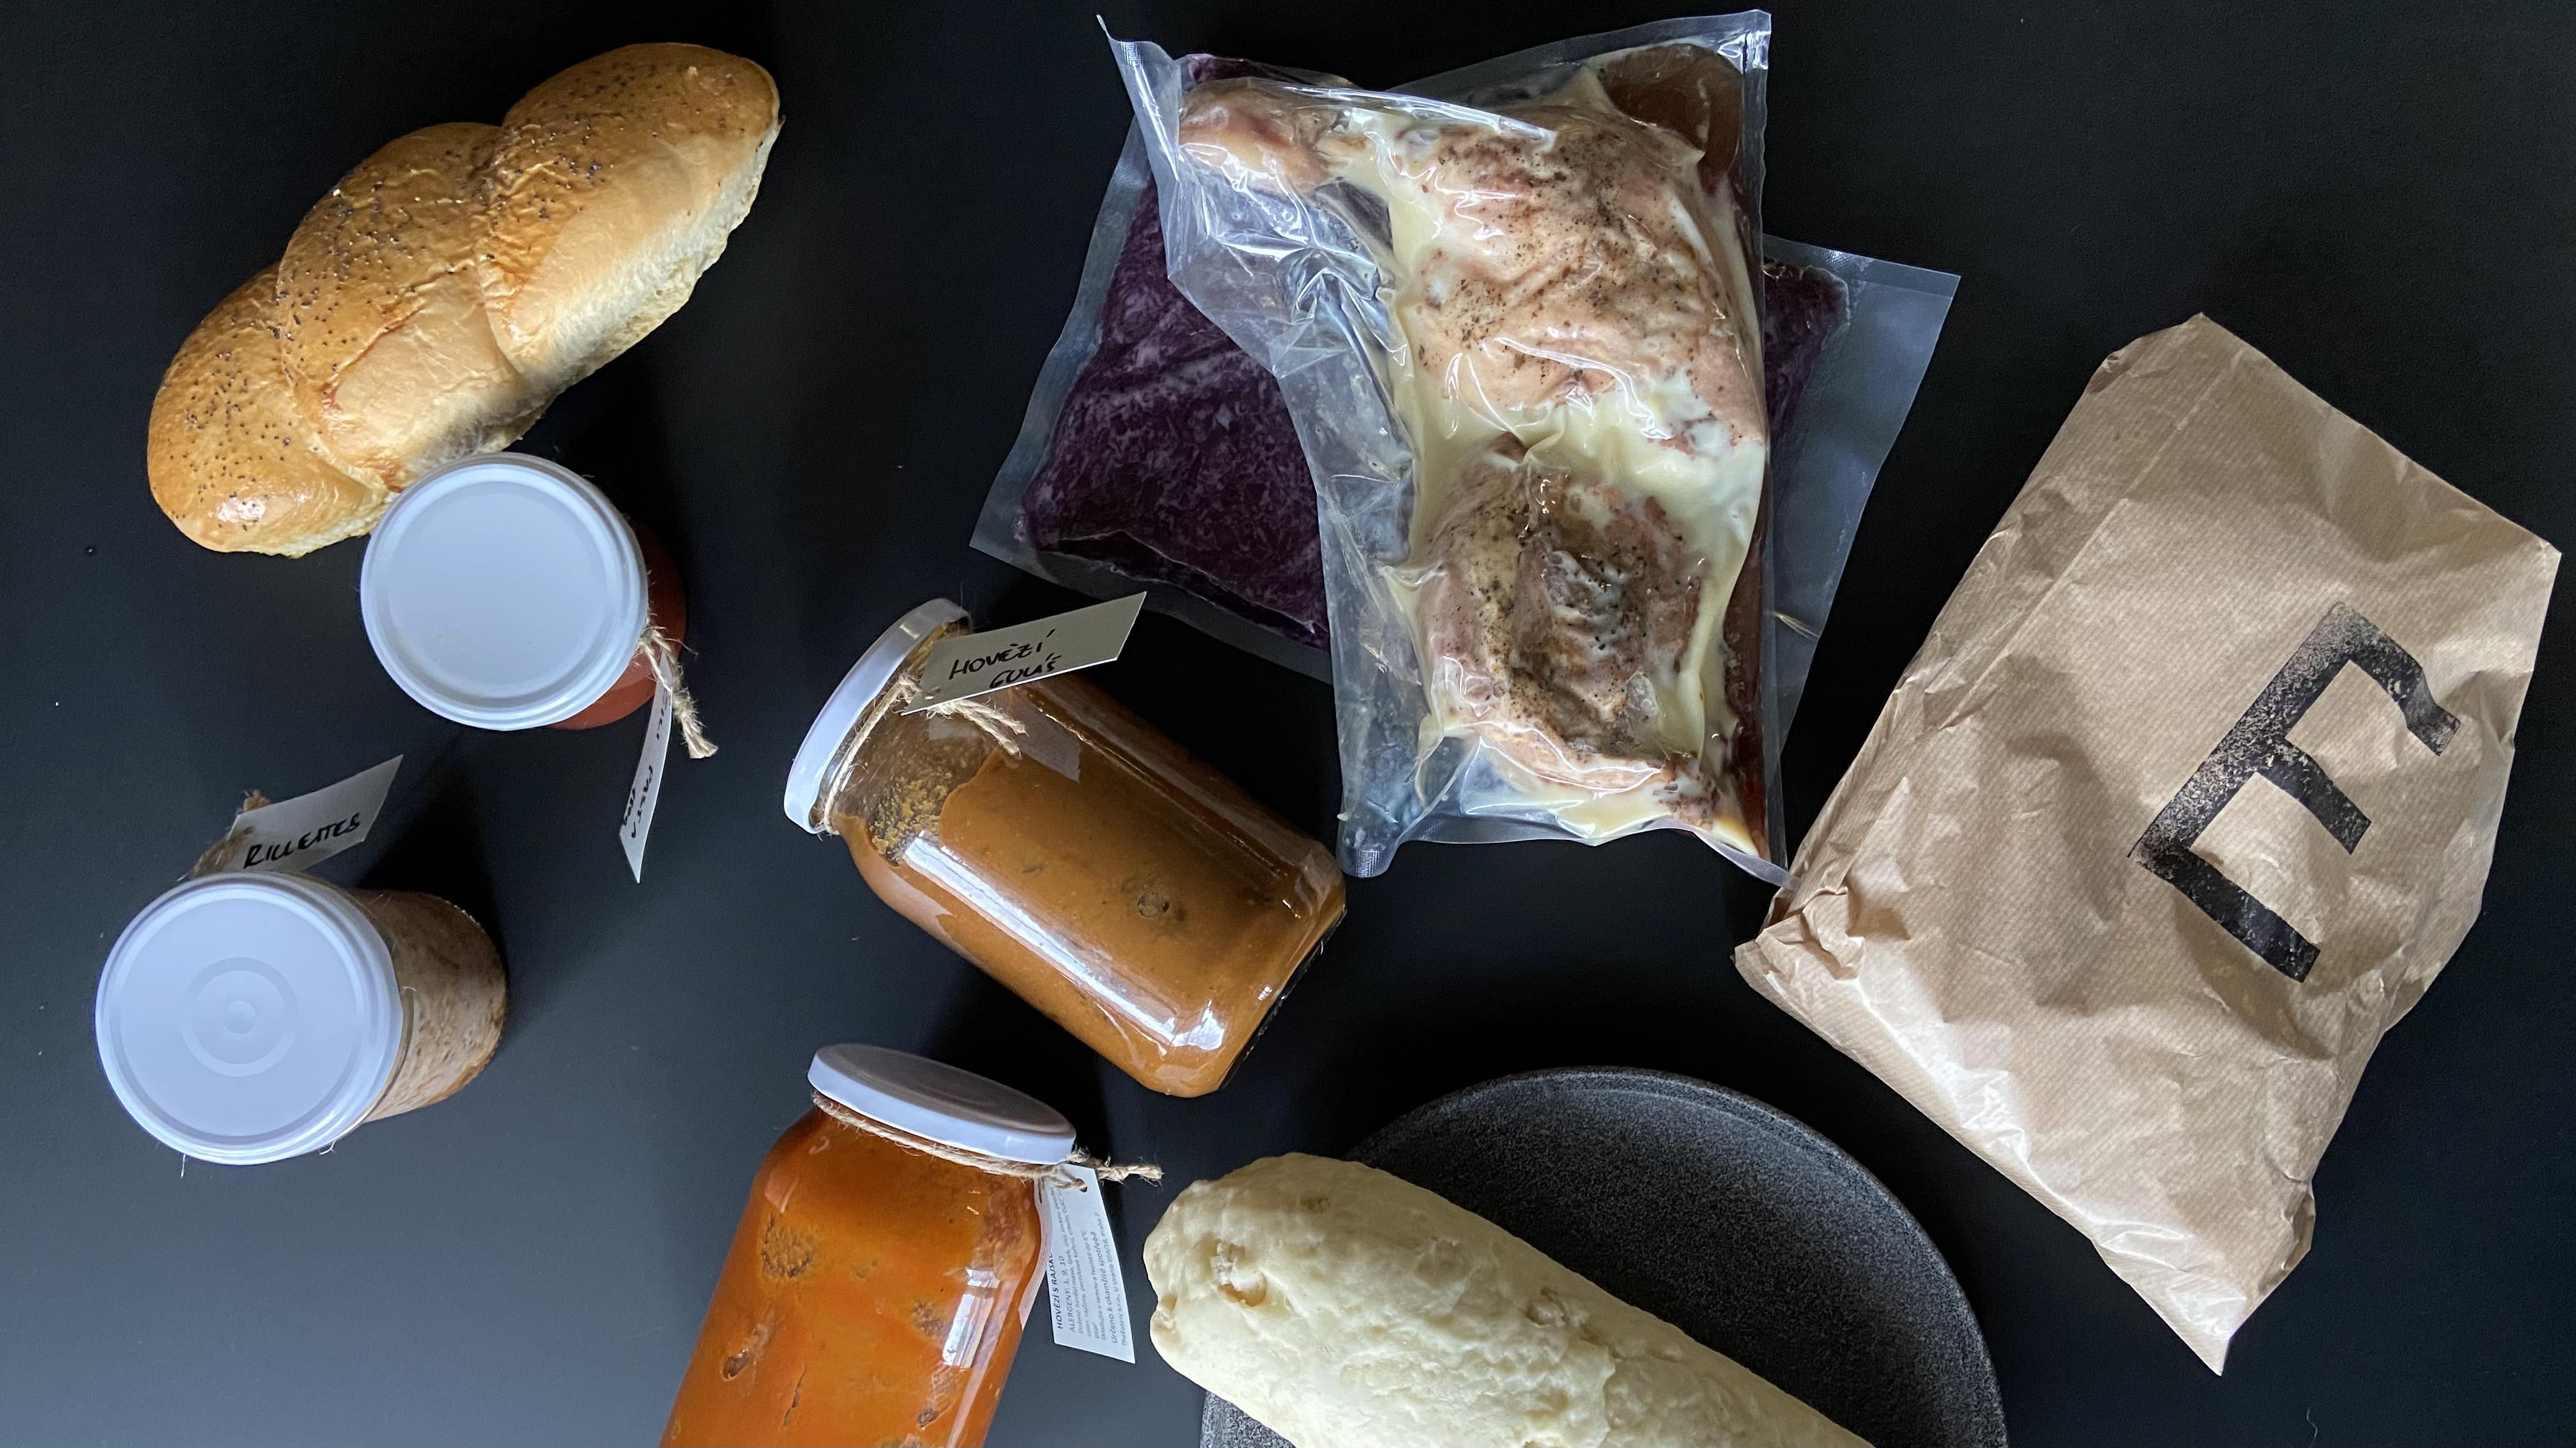 The Eatery DELI